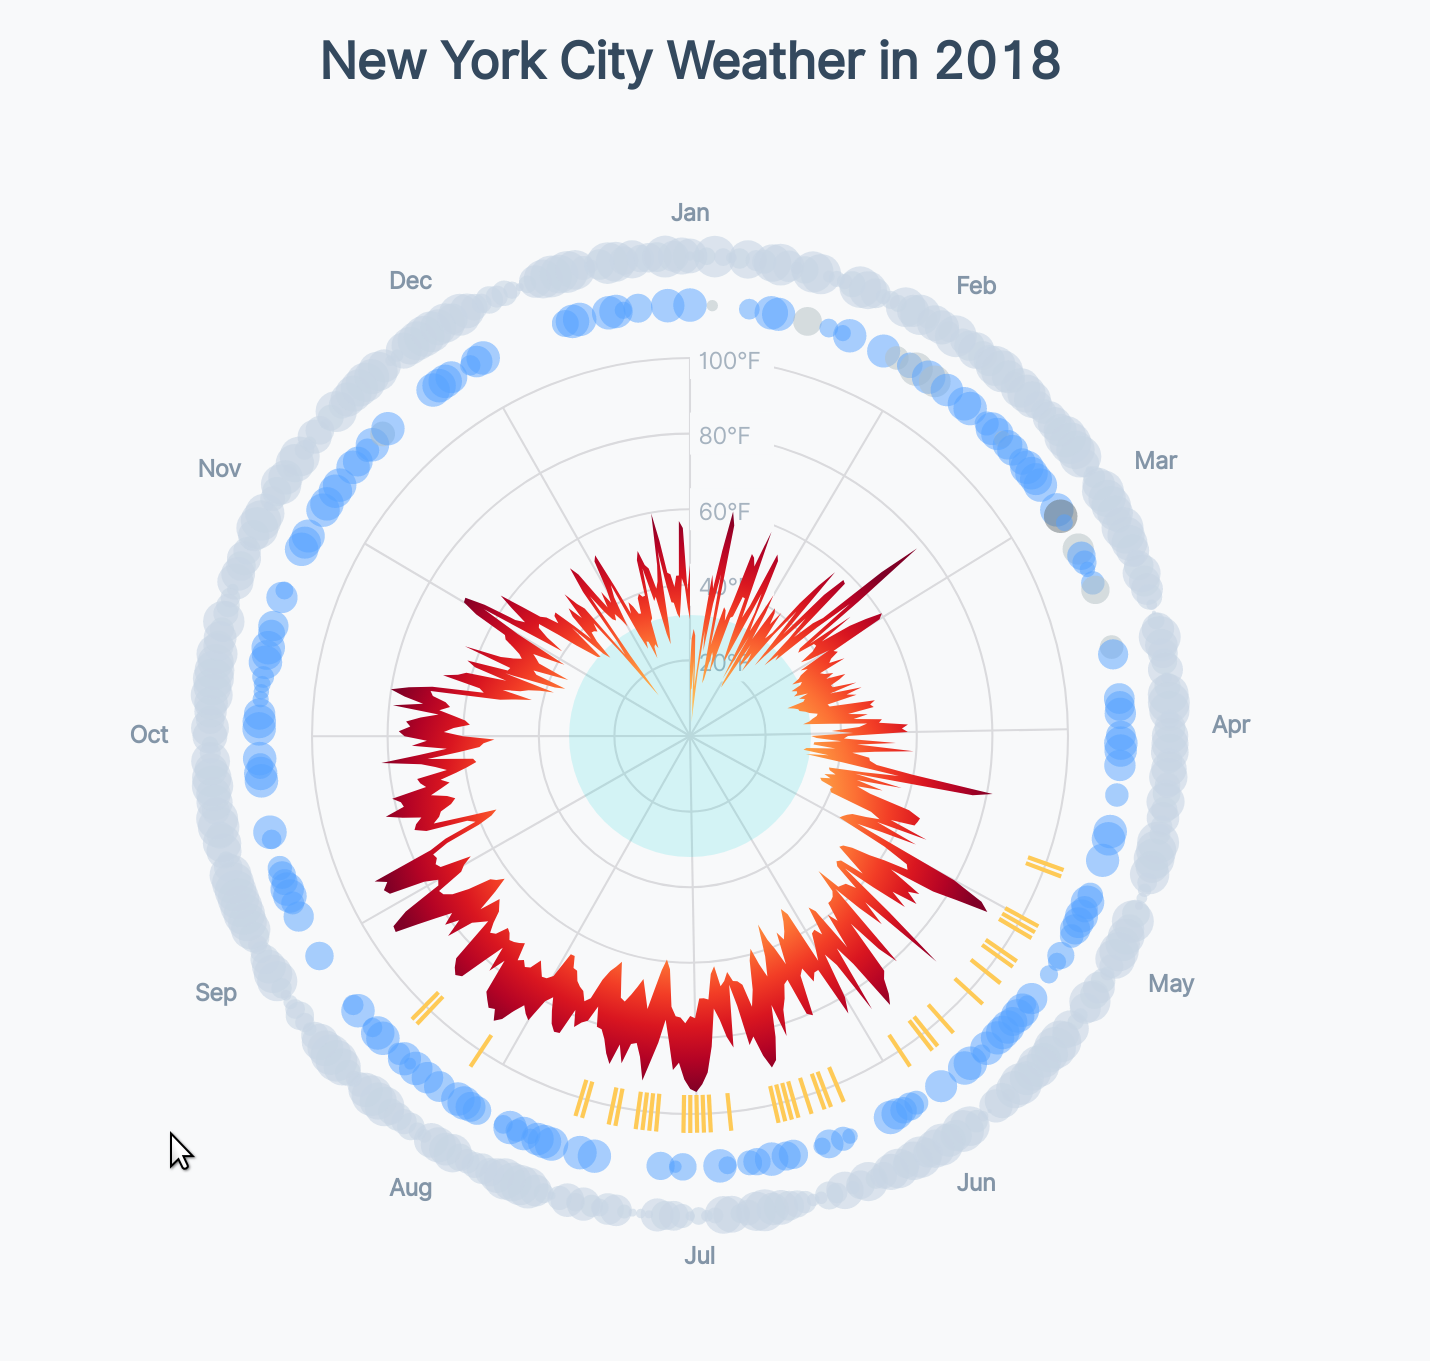 Chart with precipitation bubbles, translucent